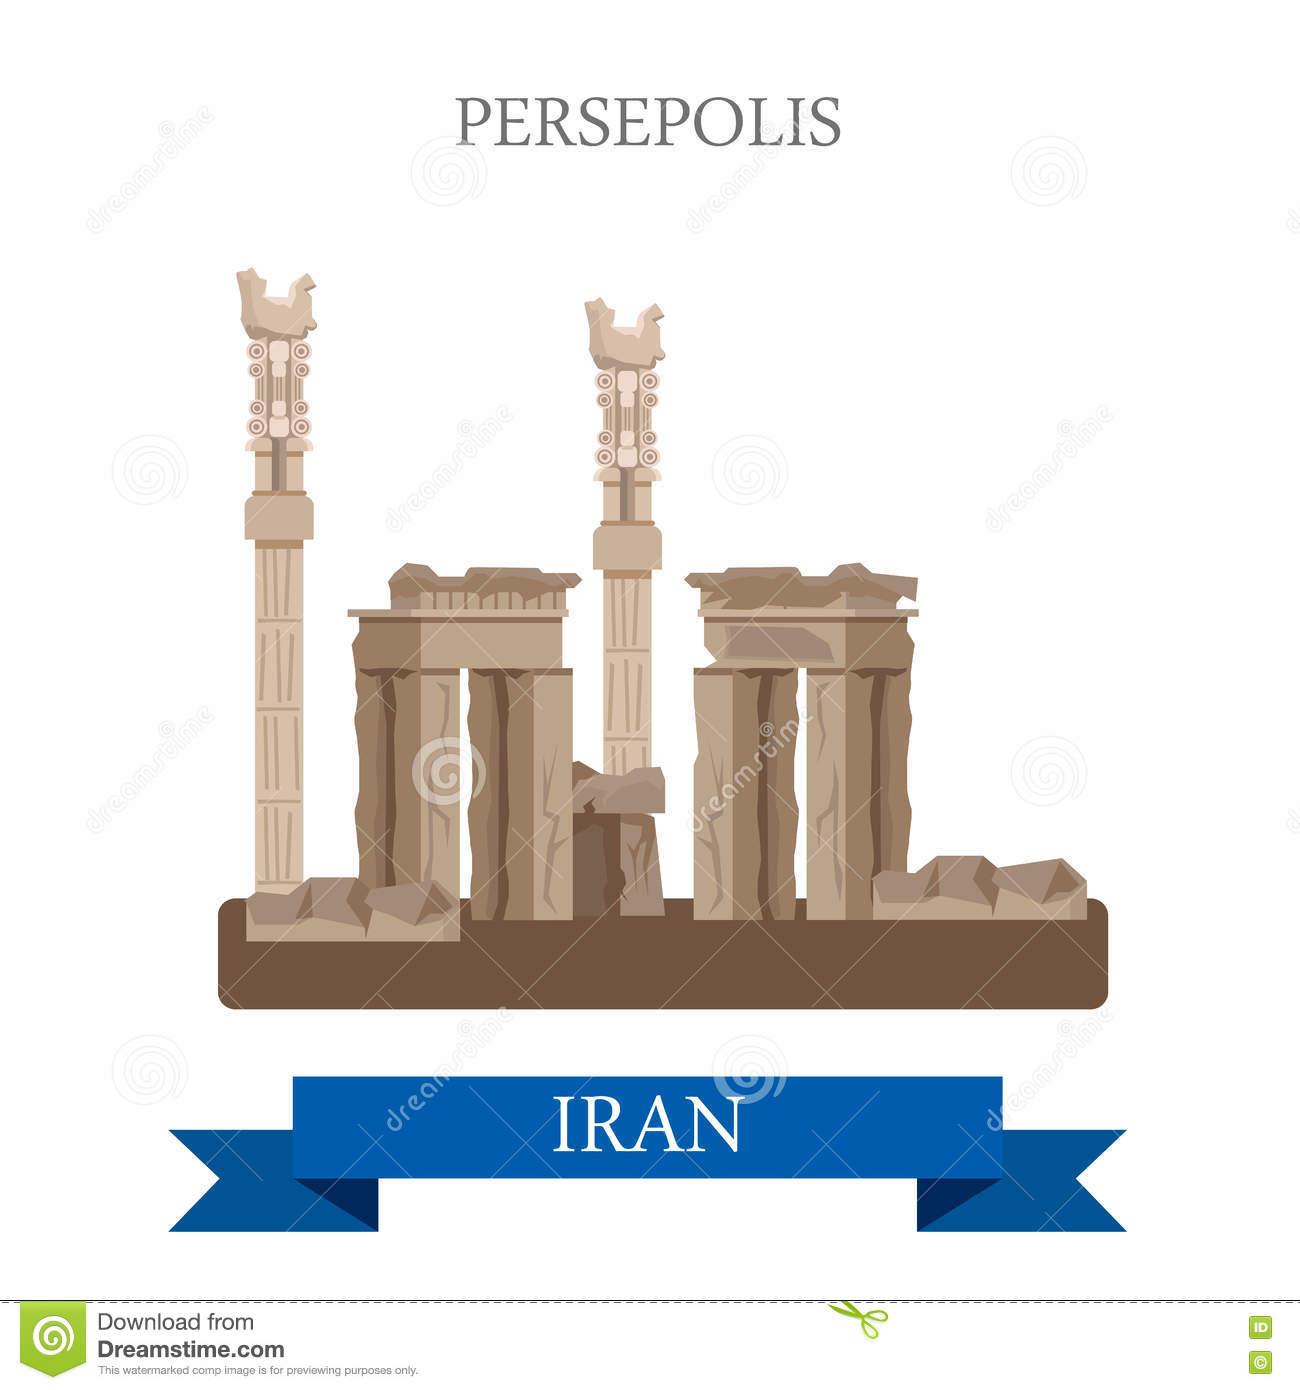 Persepolis In Iran Vector Flat Attraction Landmarks Stock Vector.